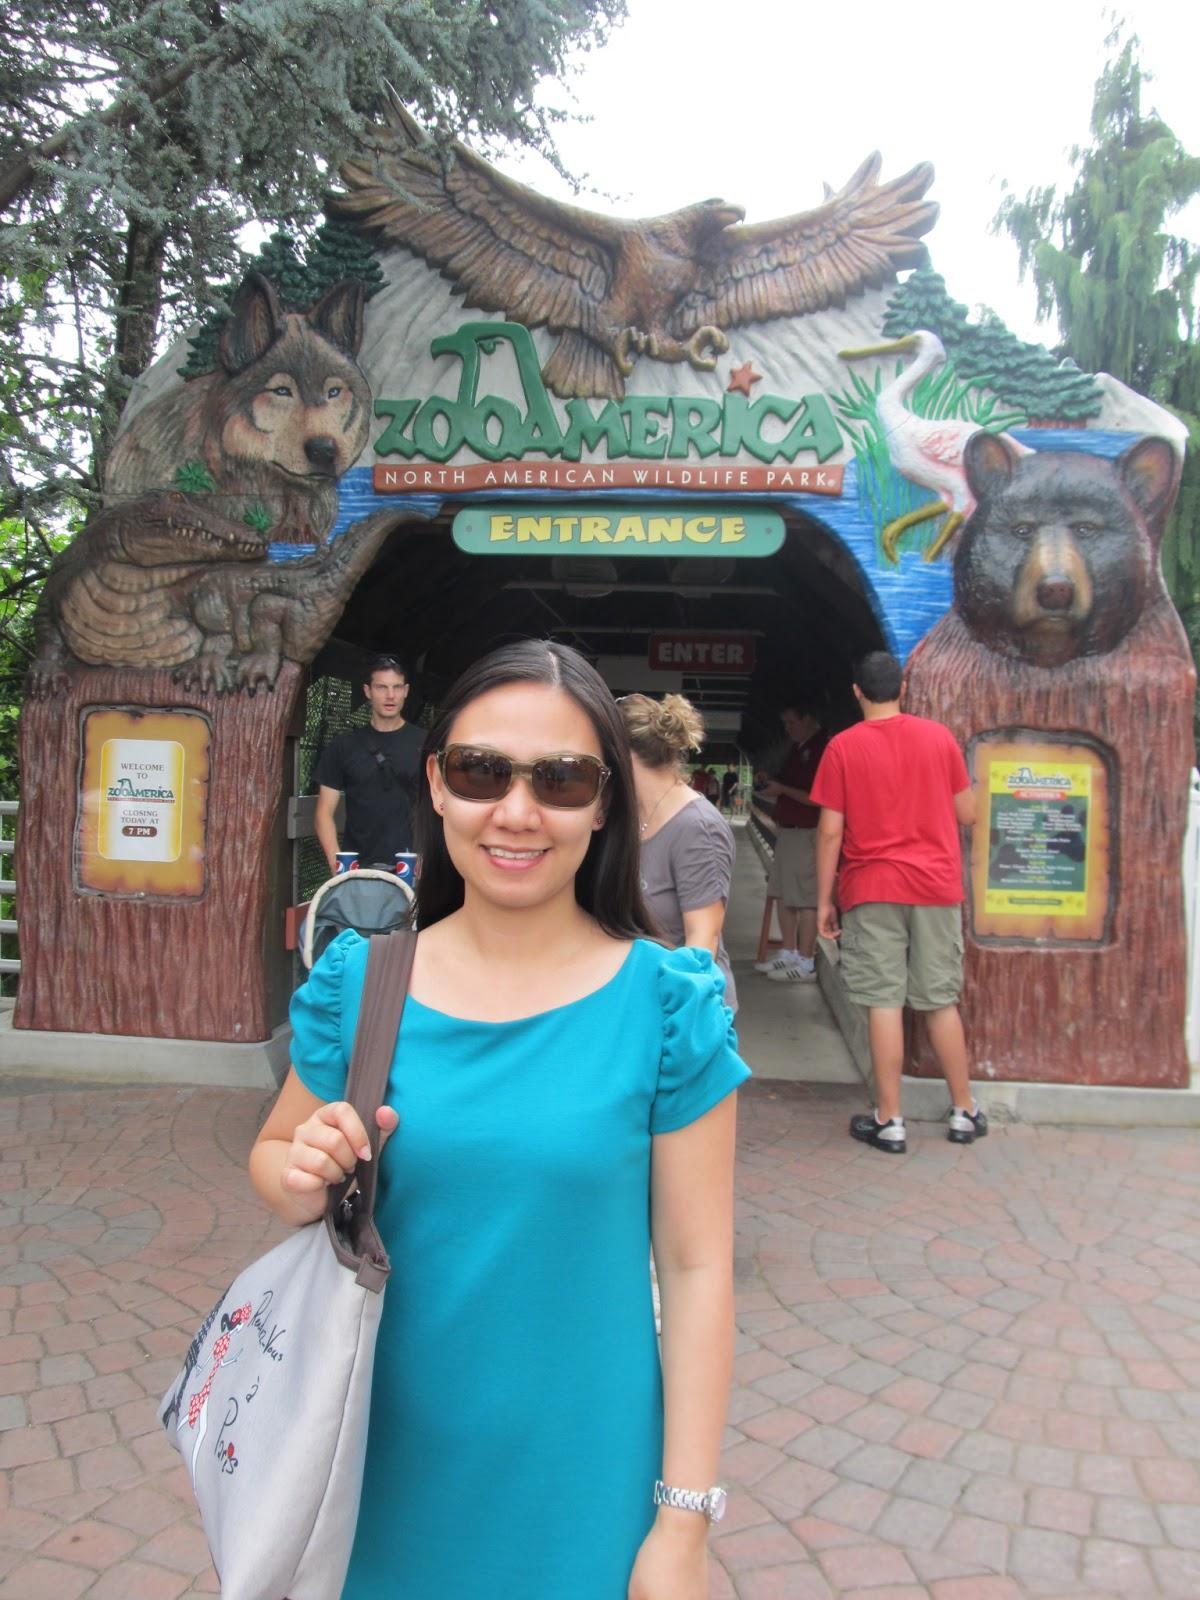 Hershey Park Zoo America